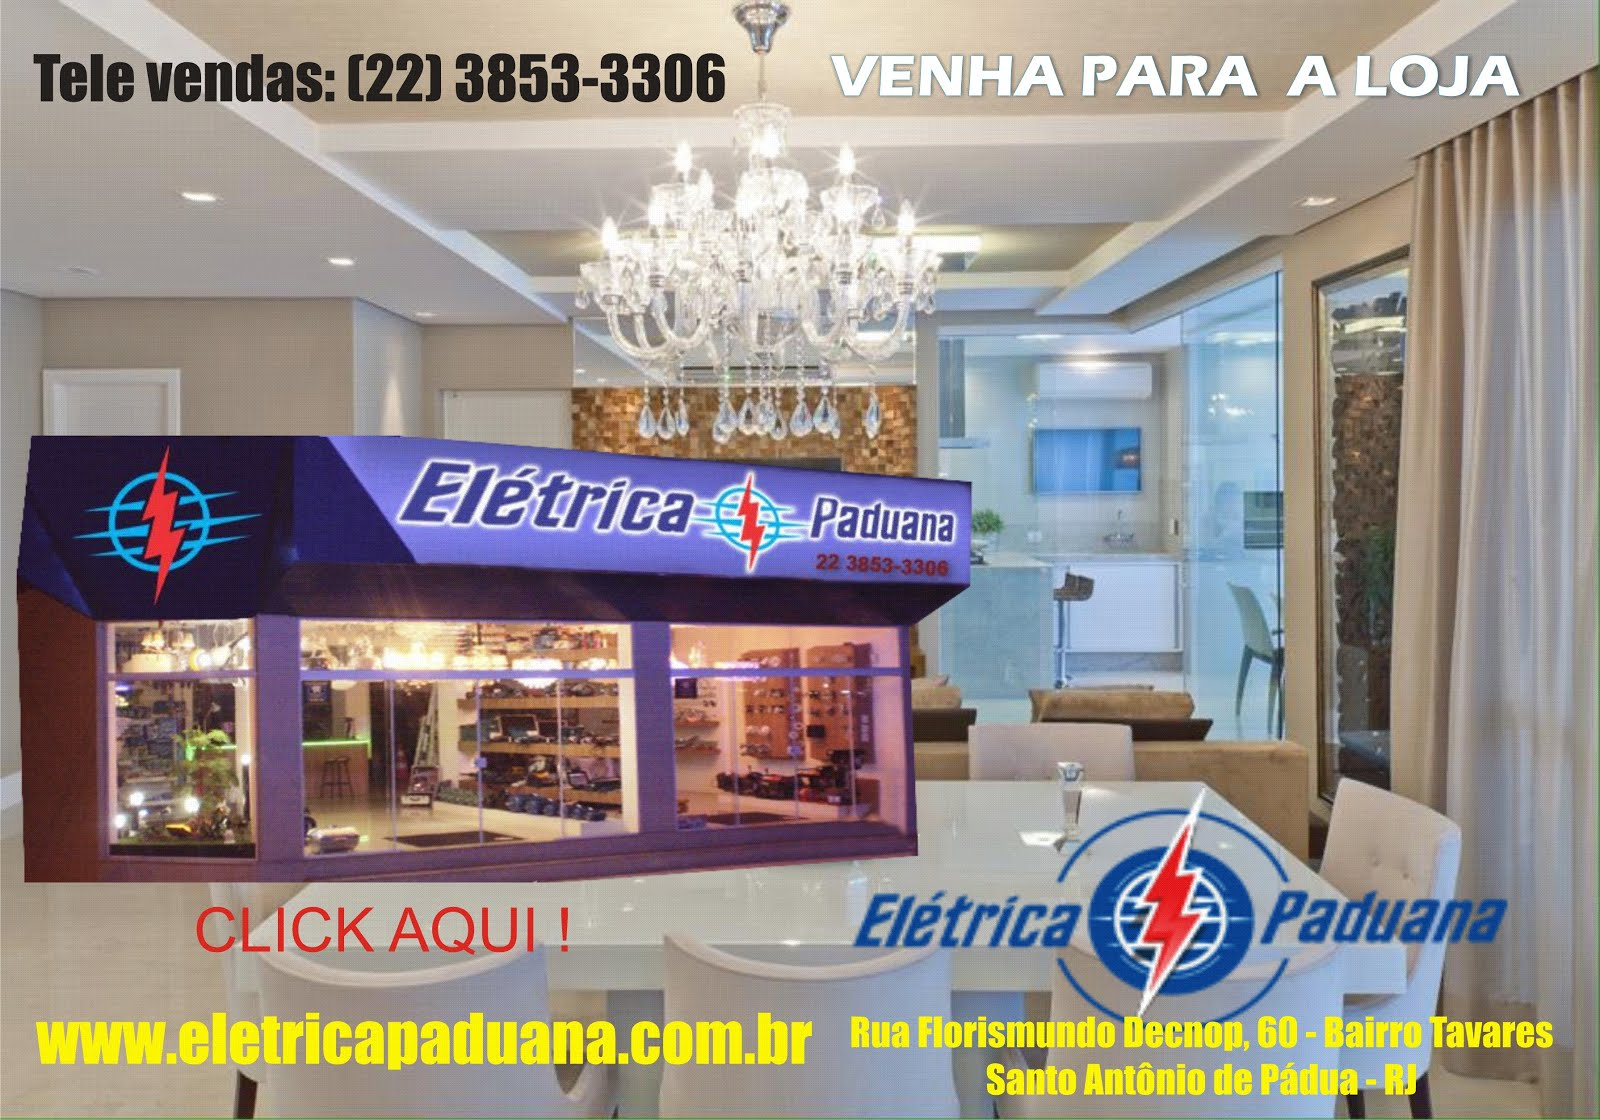 Elétrica Paduana